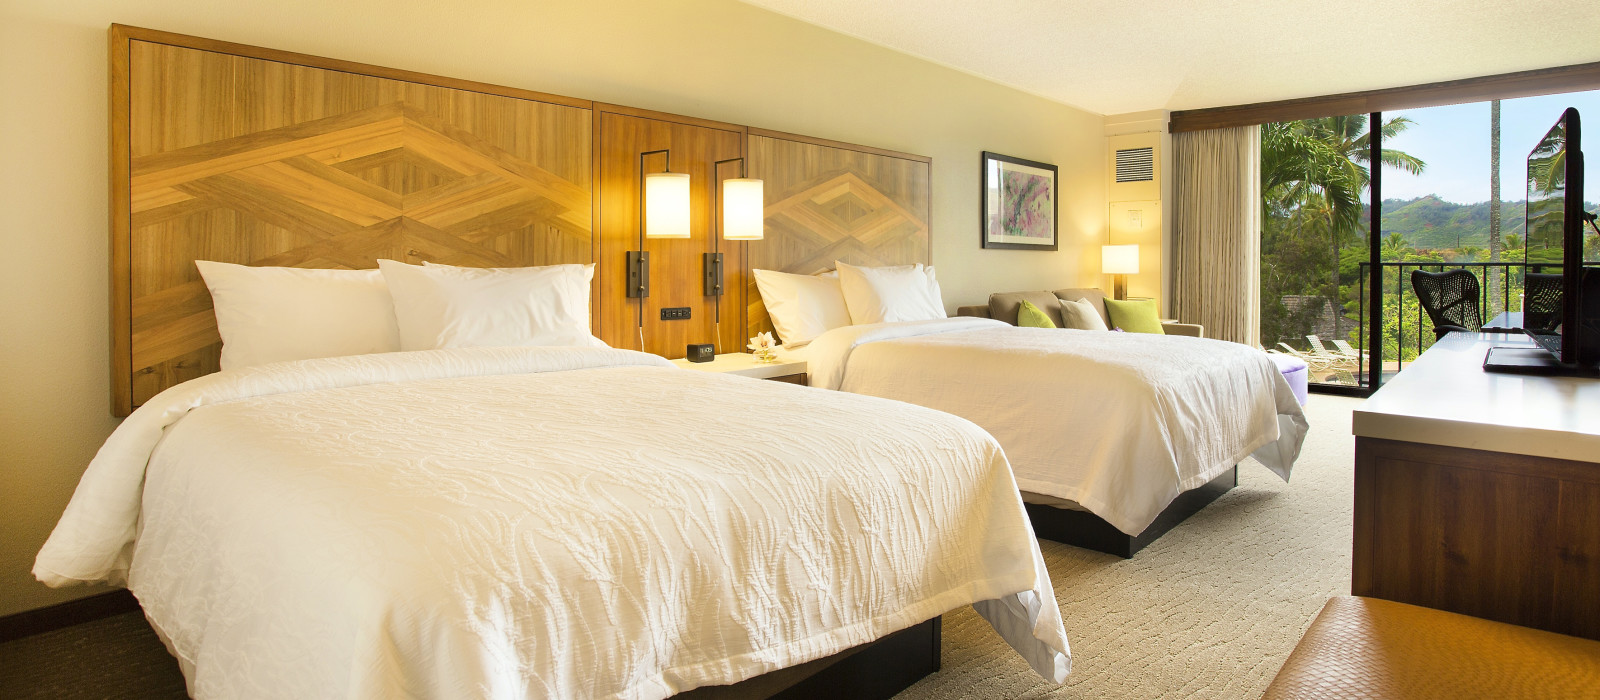 Hotel Hilton Garden Inn Kauai Hawaii